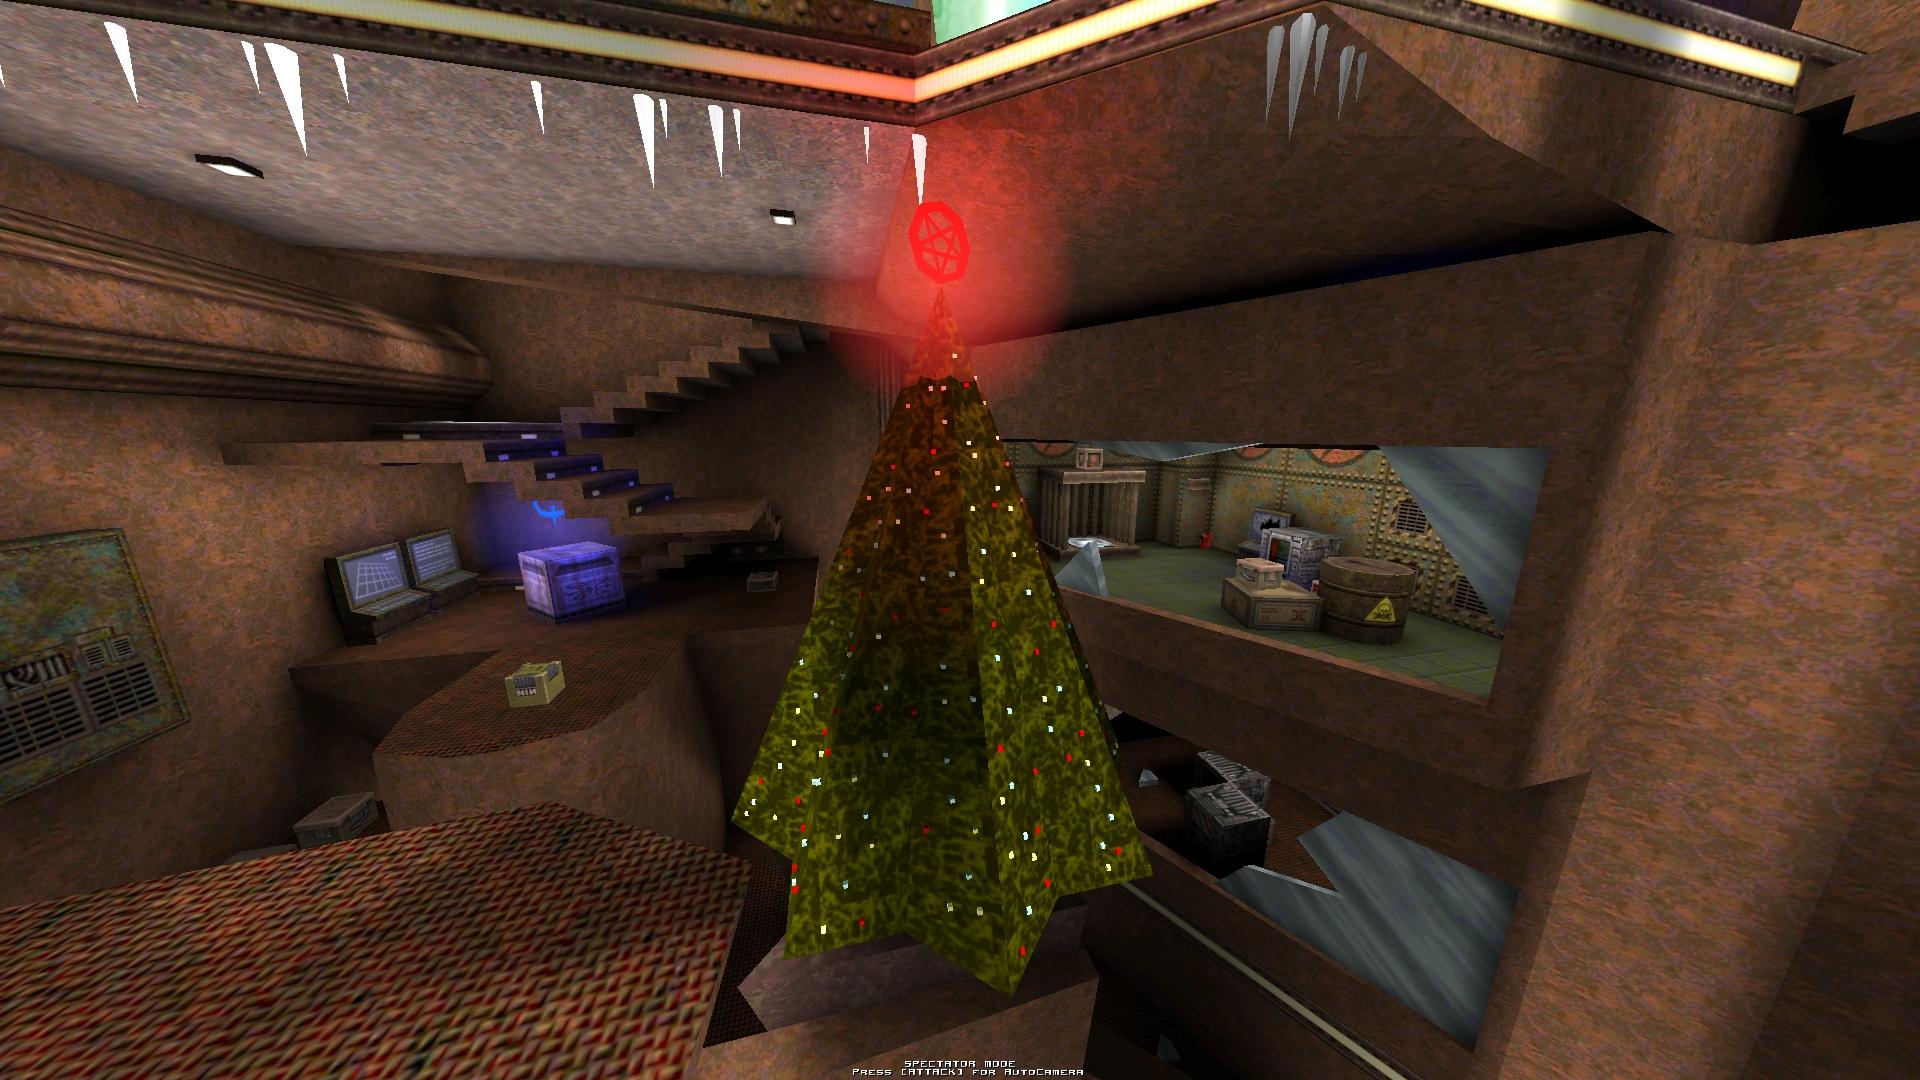 http://blaps.se/qw/map/terrorbaum/tb2.jpg